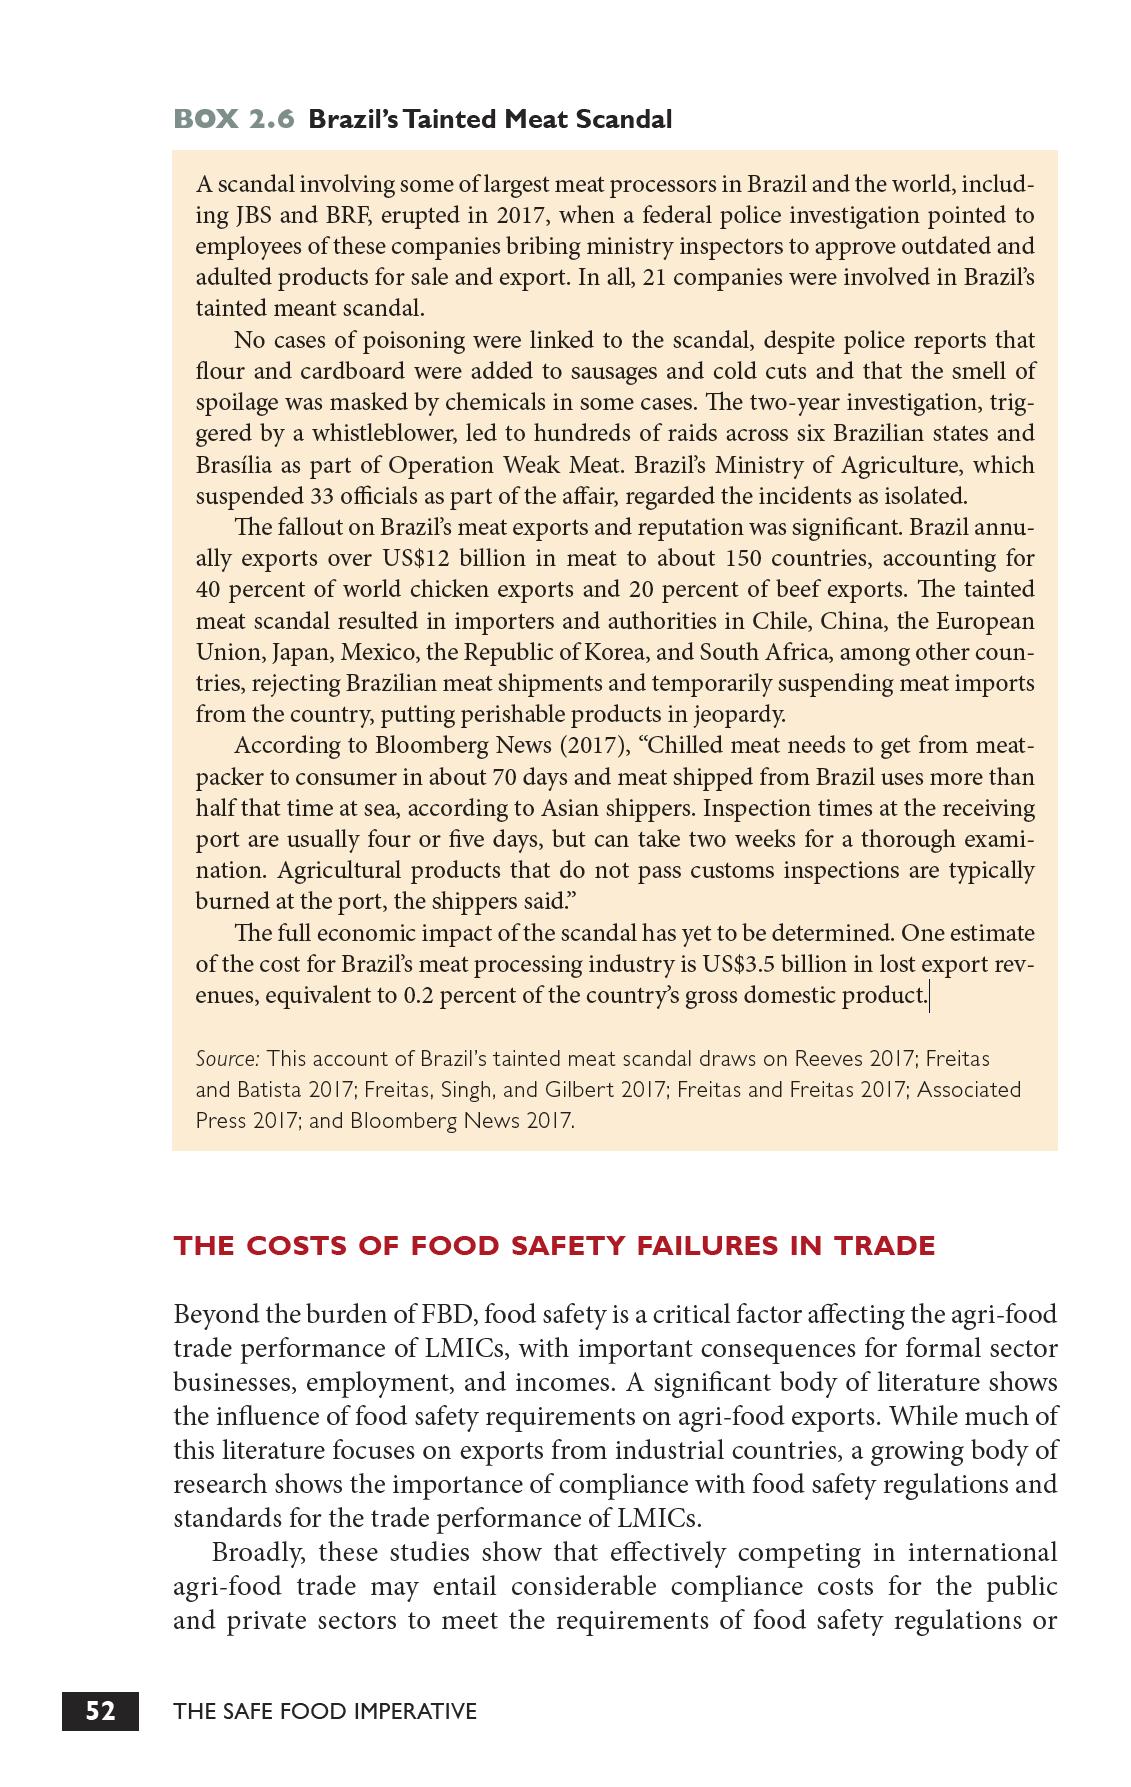 AFISA-PR - Segurança alimentar: alimentos inseguros custam US$ 110